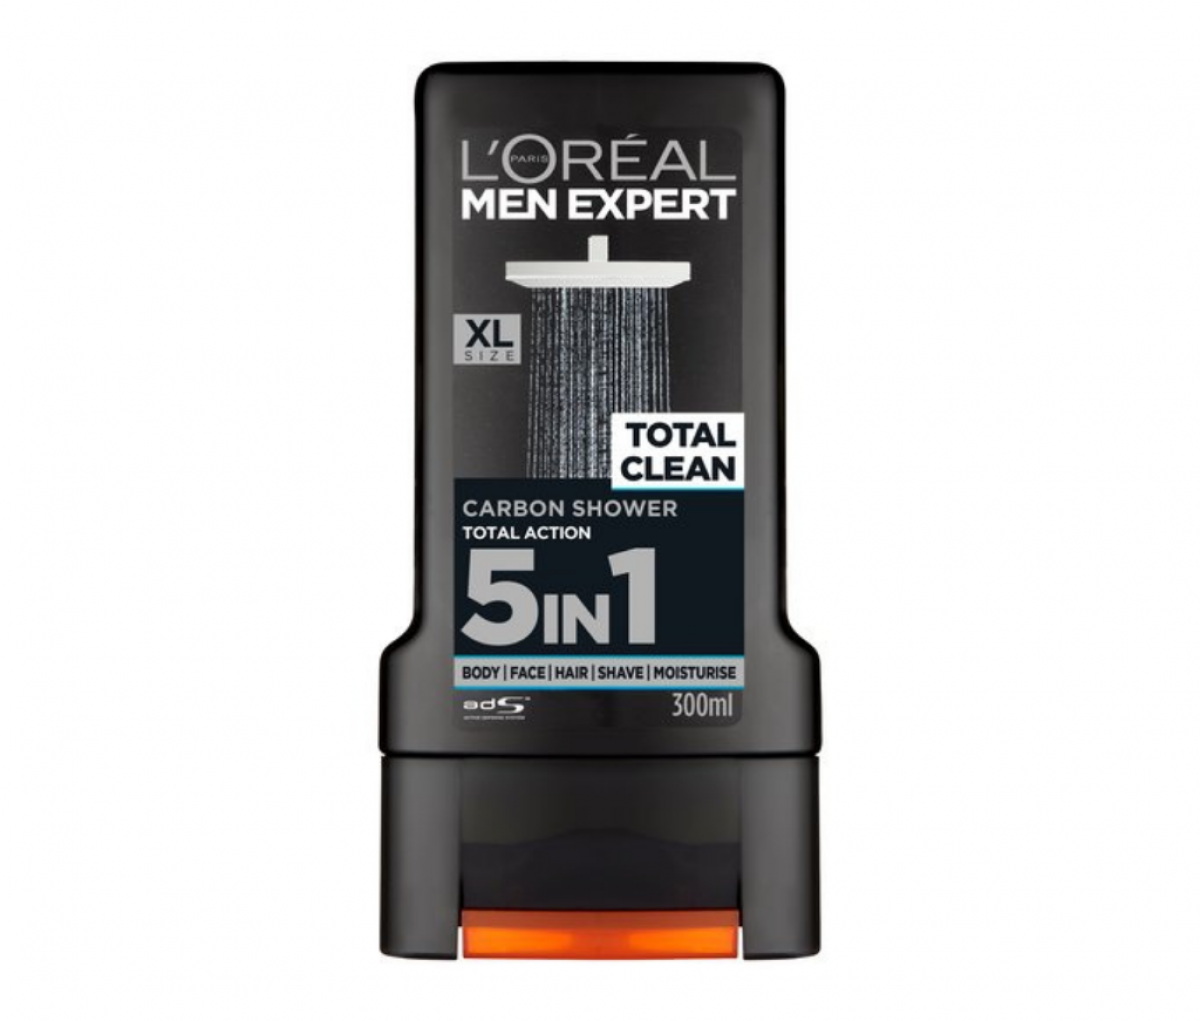 Loreal 300ml Men Expert Total Clean Shower Gel